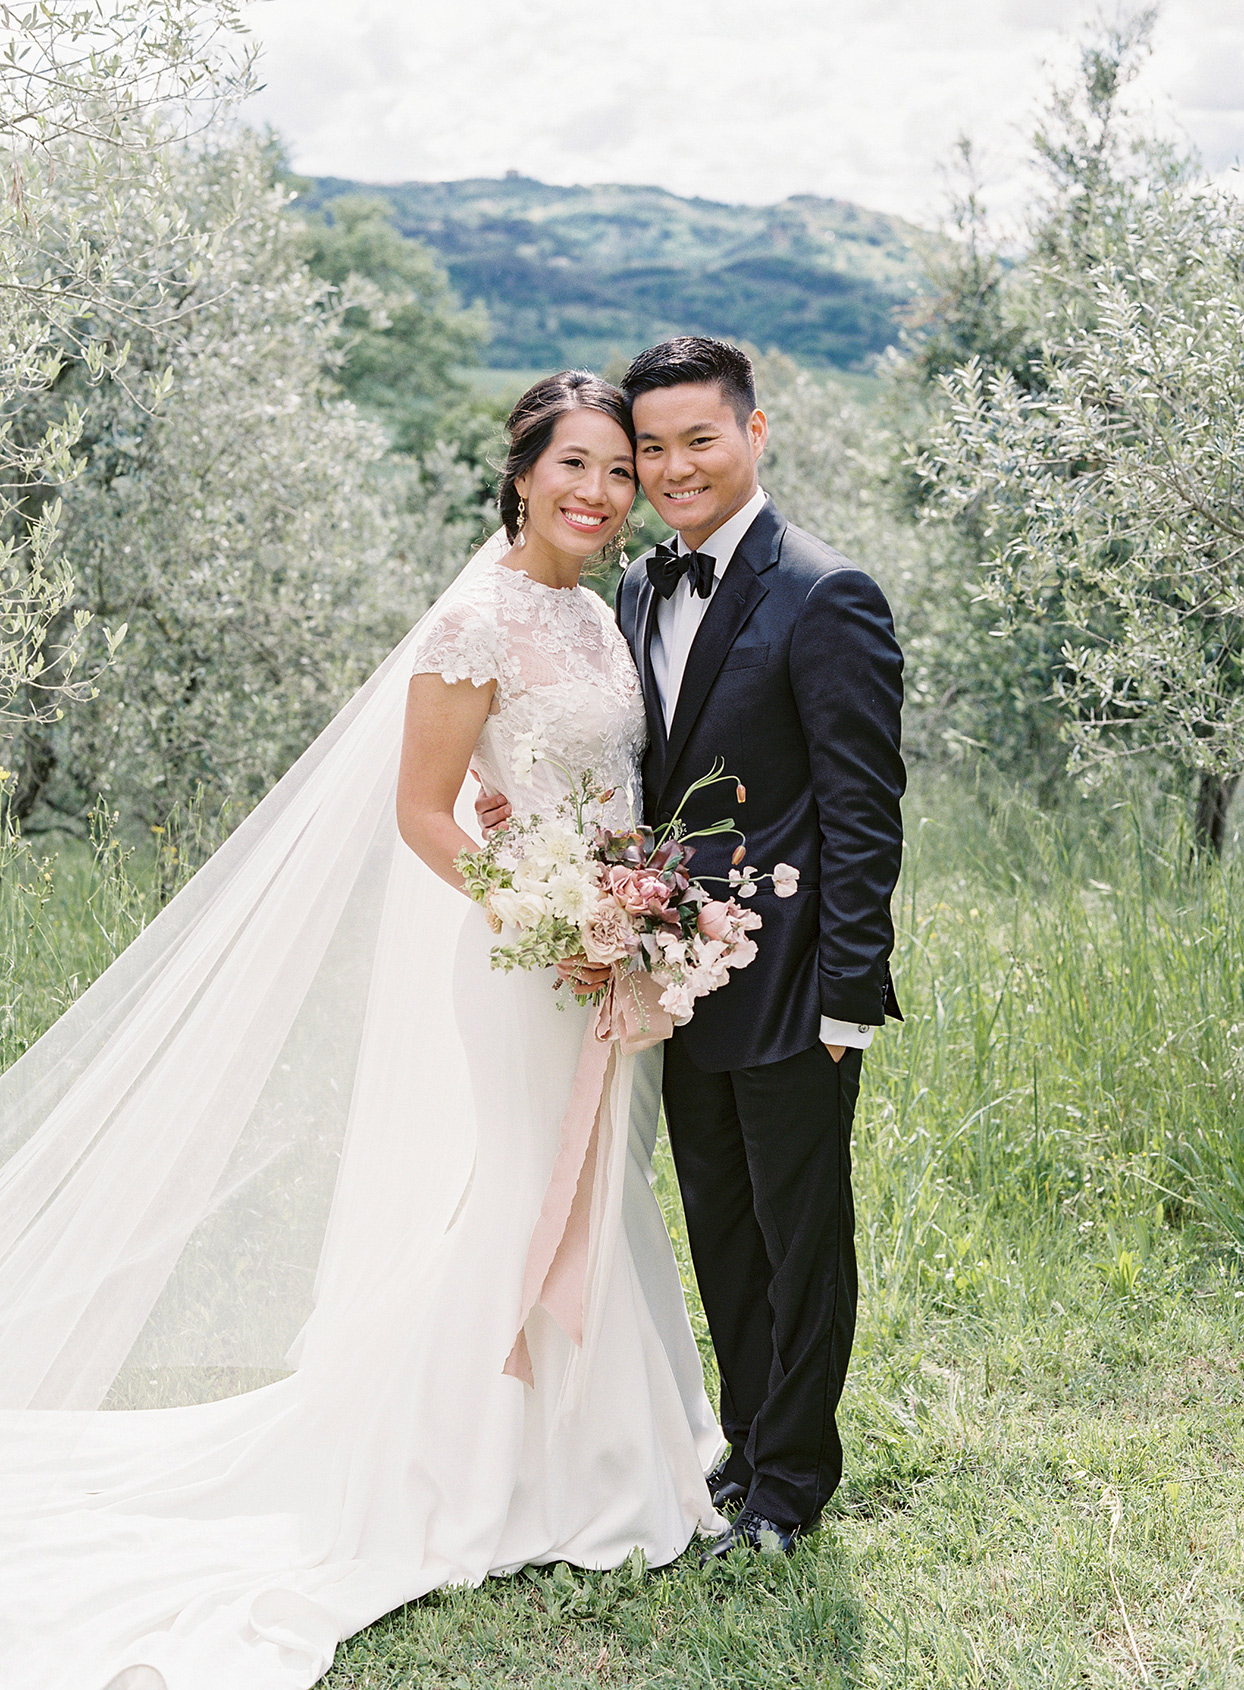 jen alan wedding couple against mountain backdrop